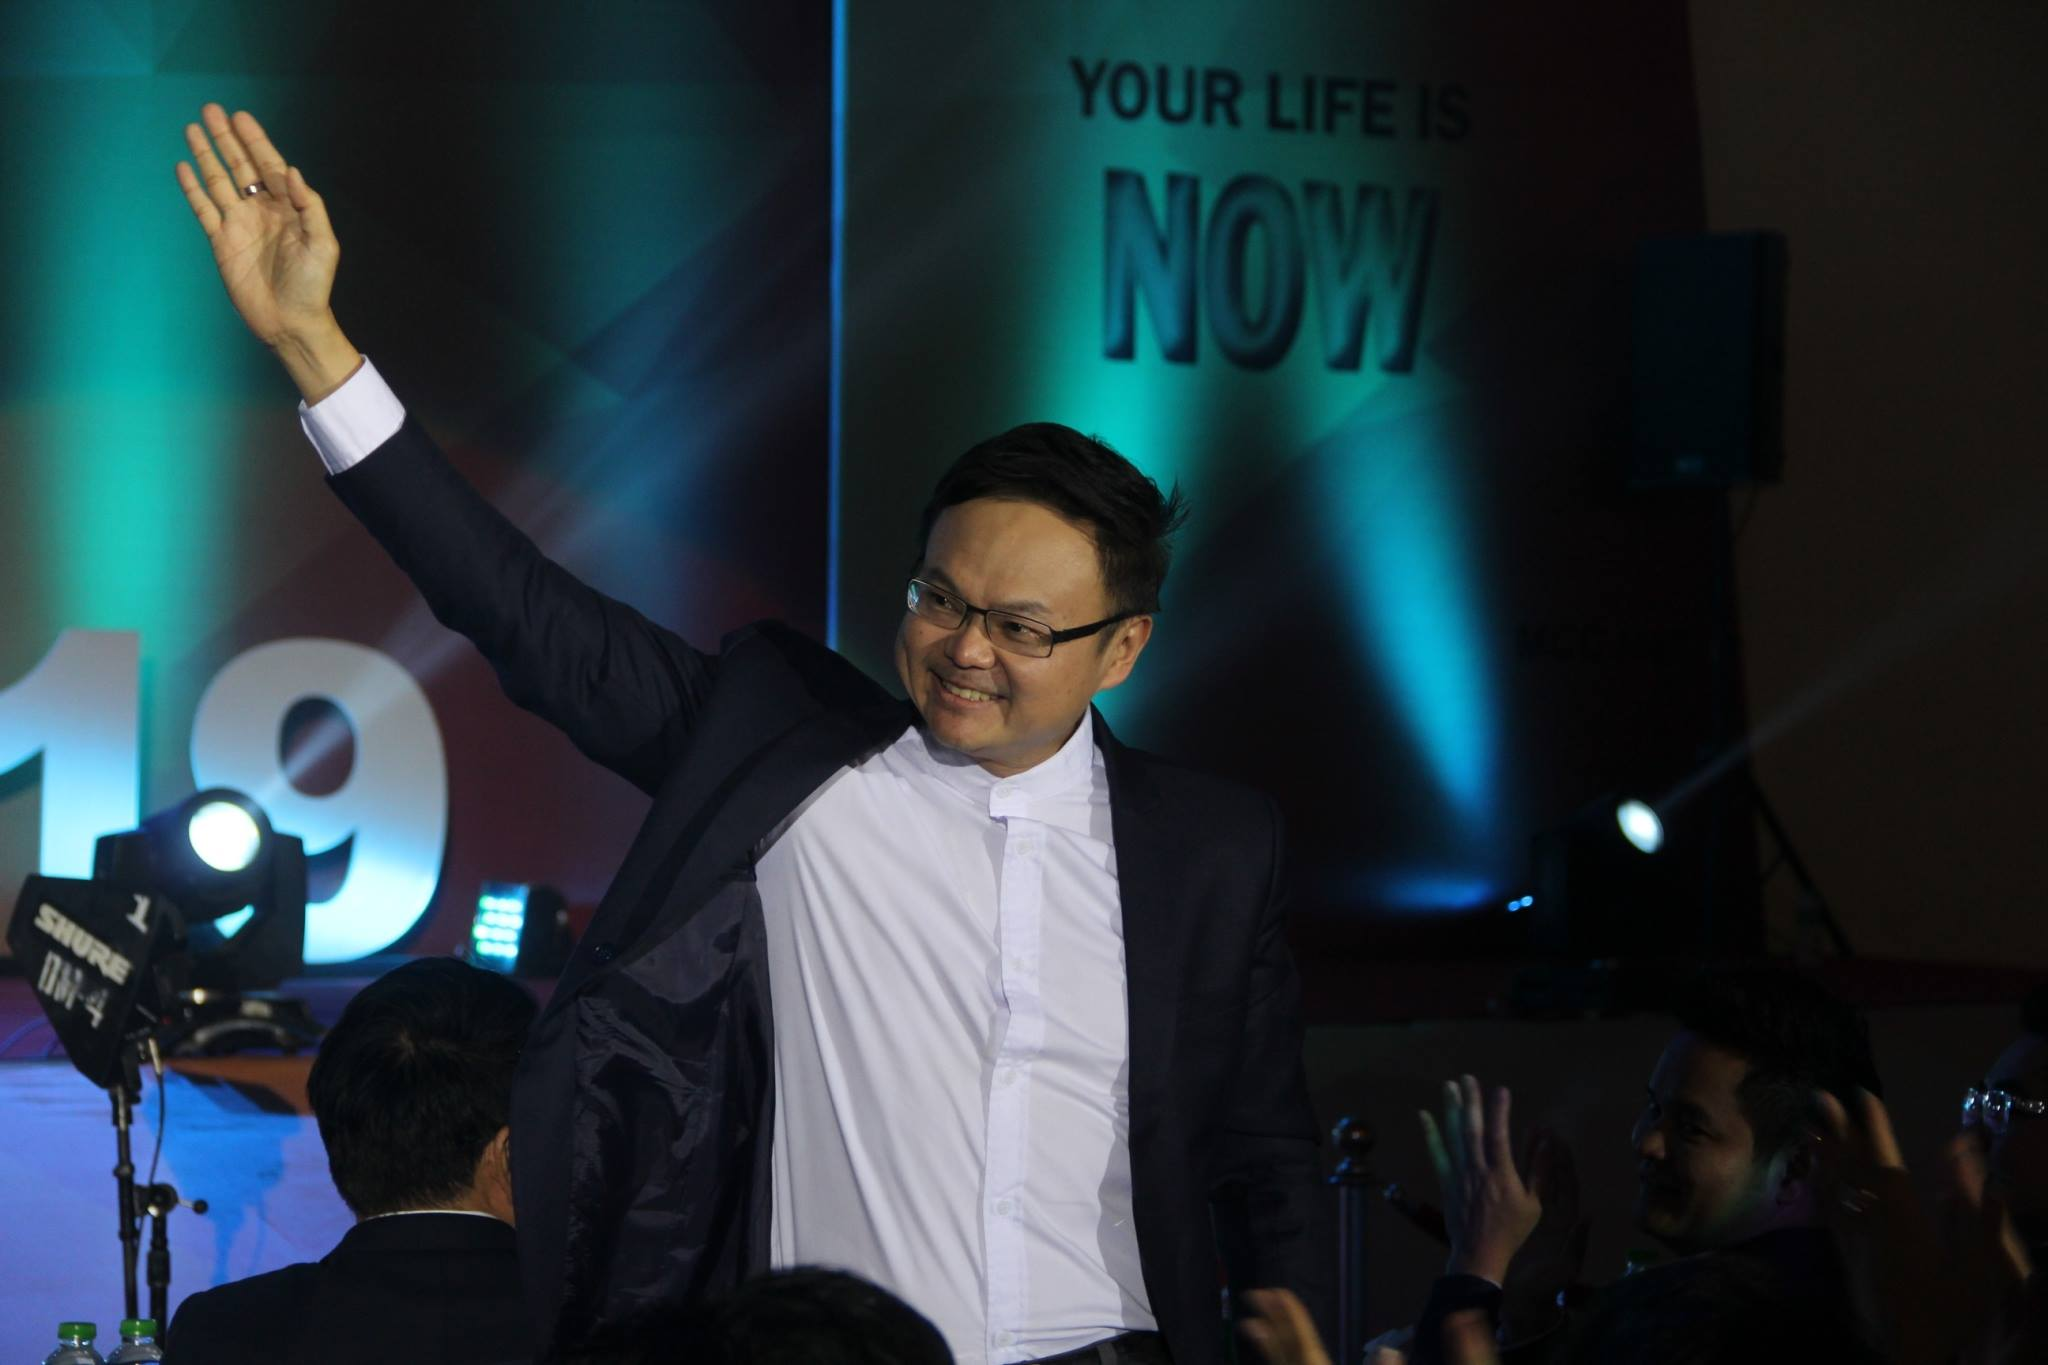 SUCCESSMORE Inspiration ครั้งที่ 19 ประเทศเมียนมา (3)